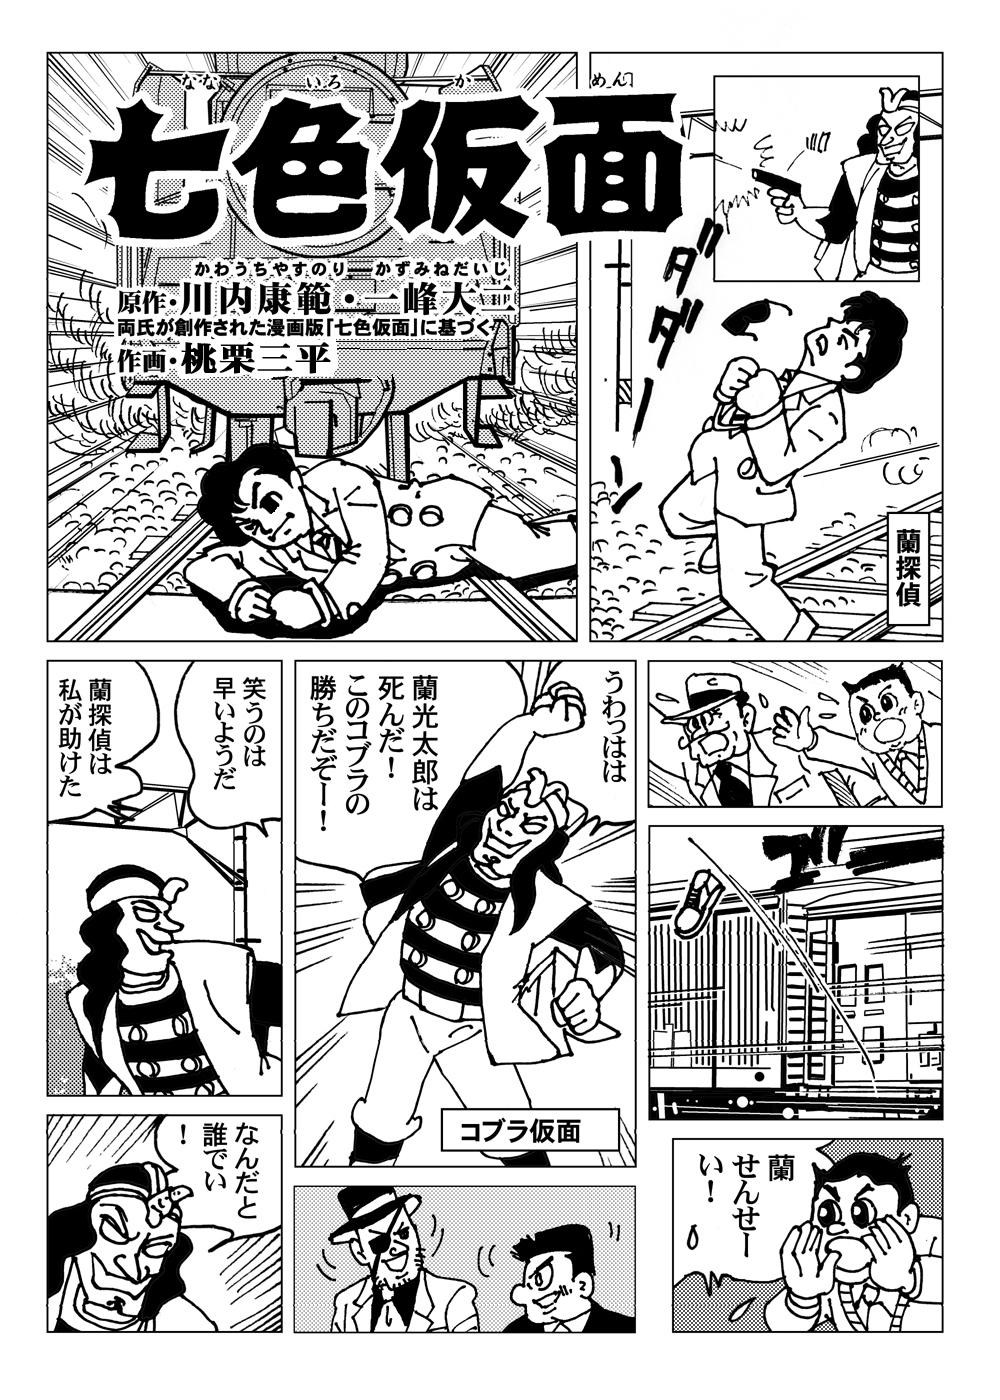 002-七色仮面*001-m